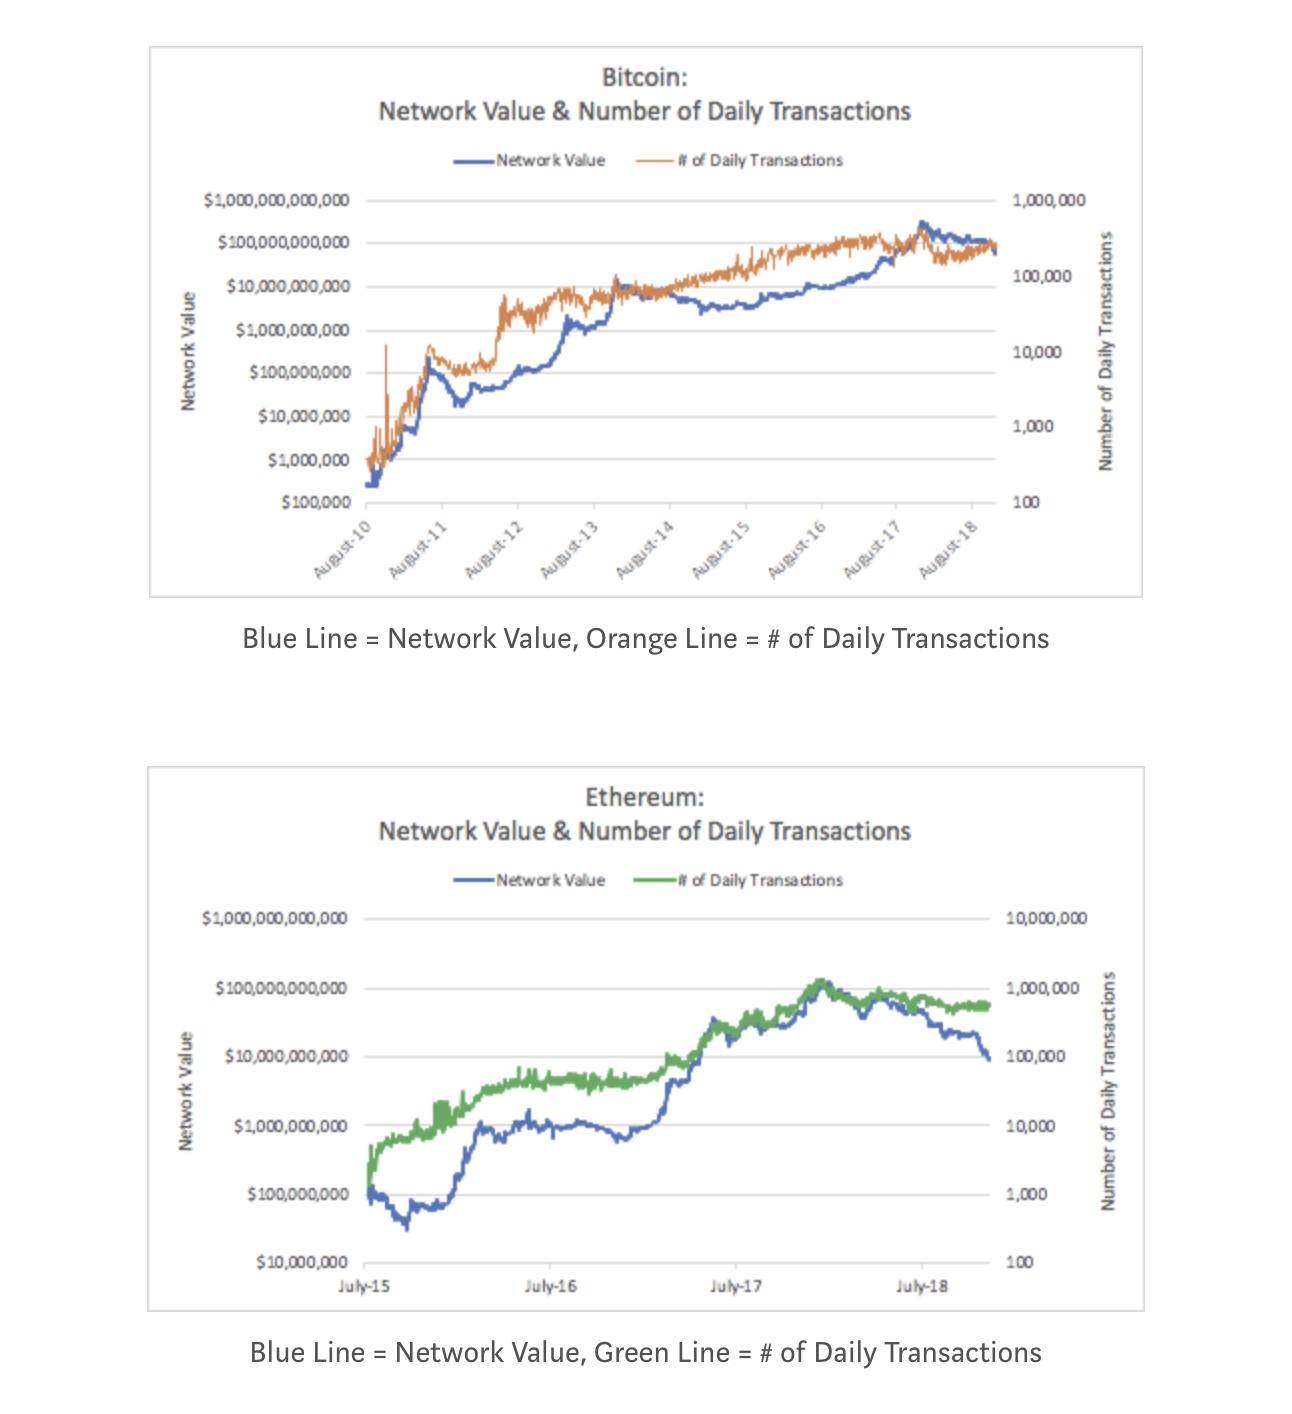 Bitcoin fundamentals